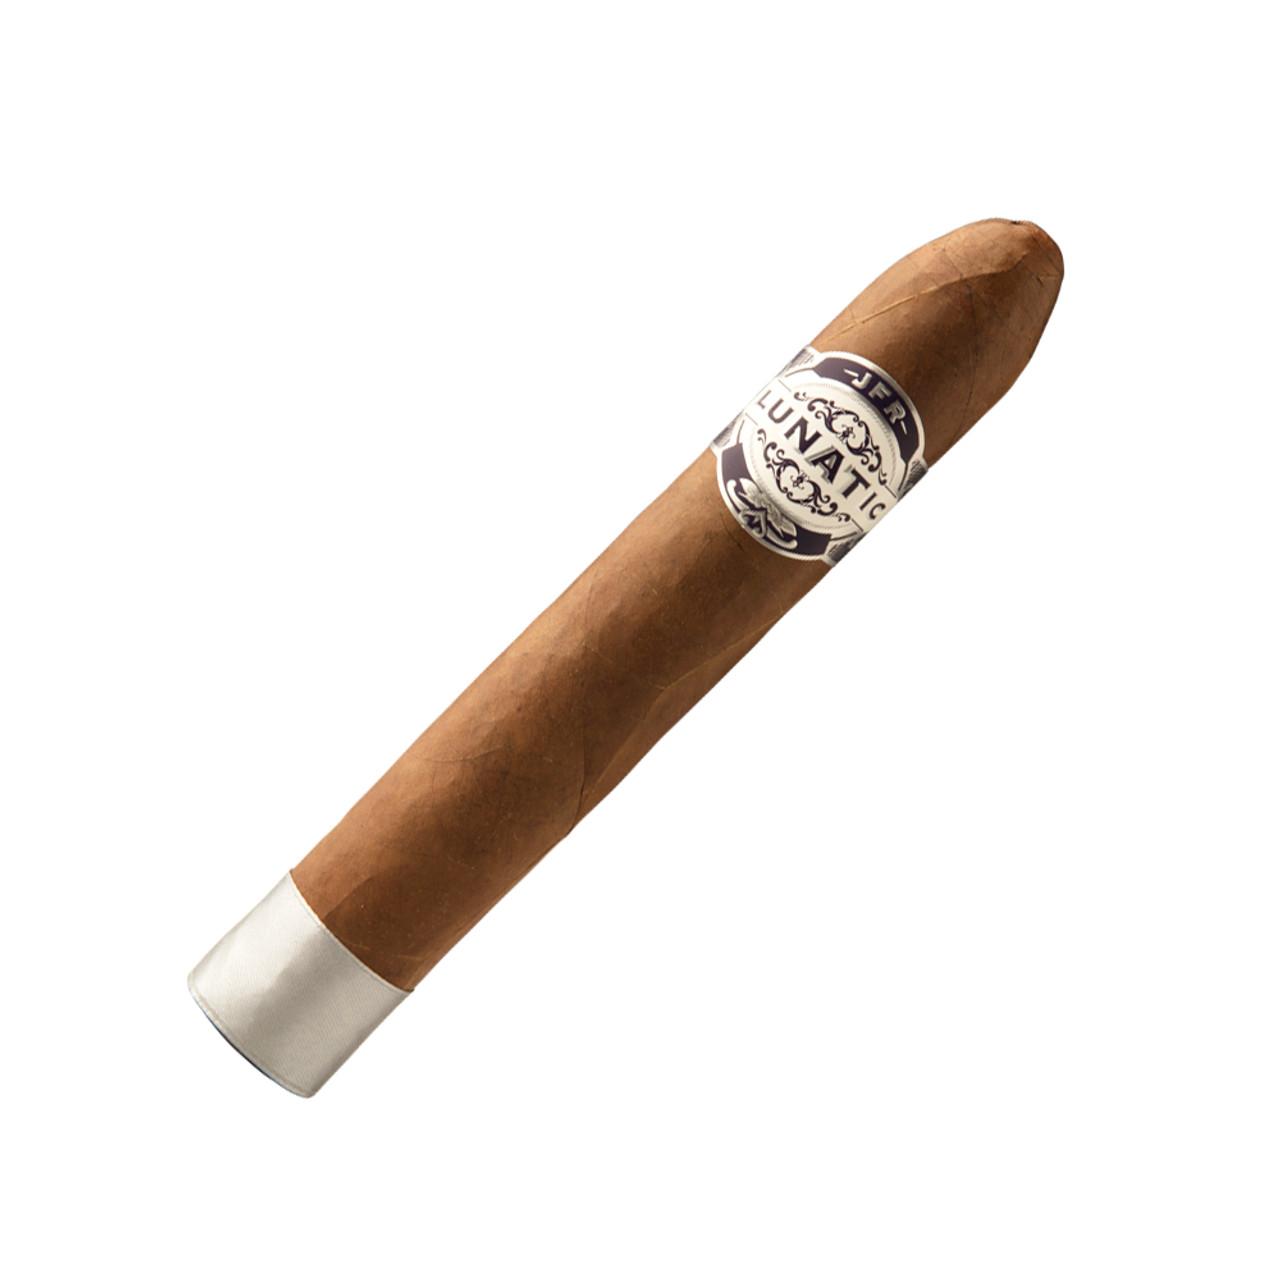 Casa Fernandez Lunatic Habano Cigars - 8 x 80 (Box of 24)